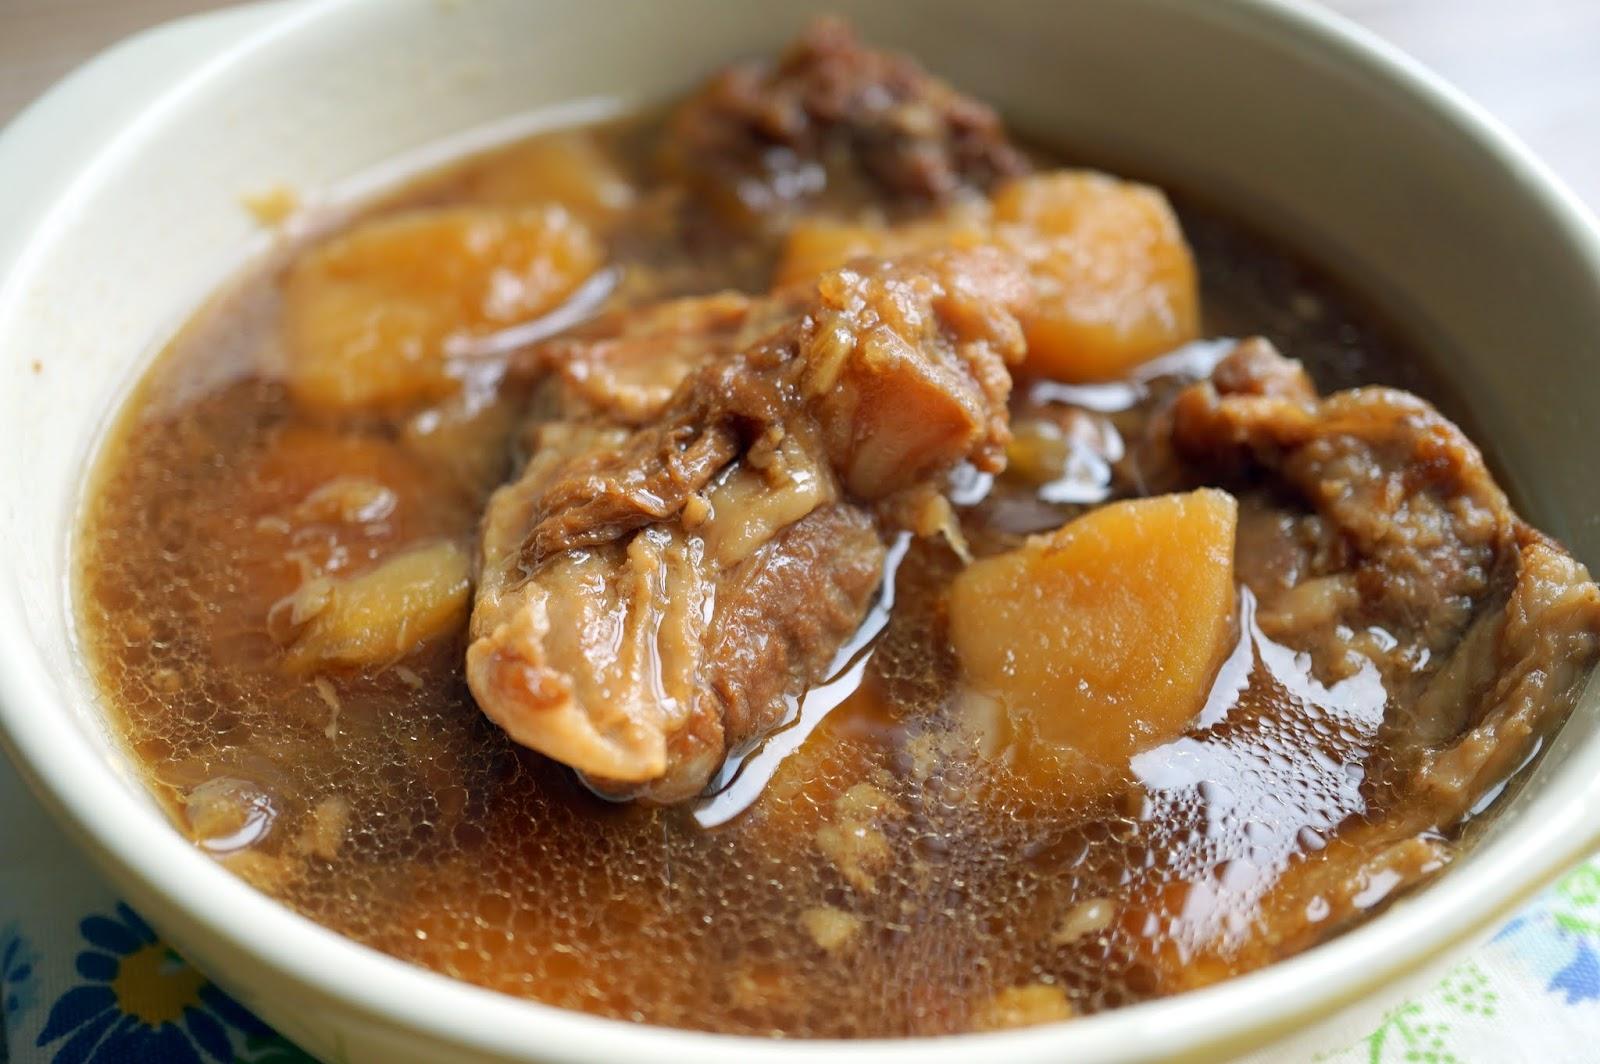 OL醉愛廚房: 日式豬軟骨